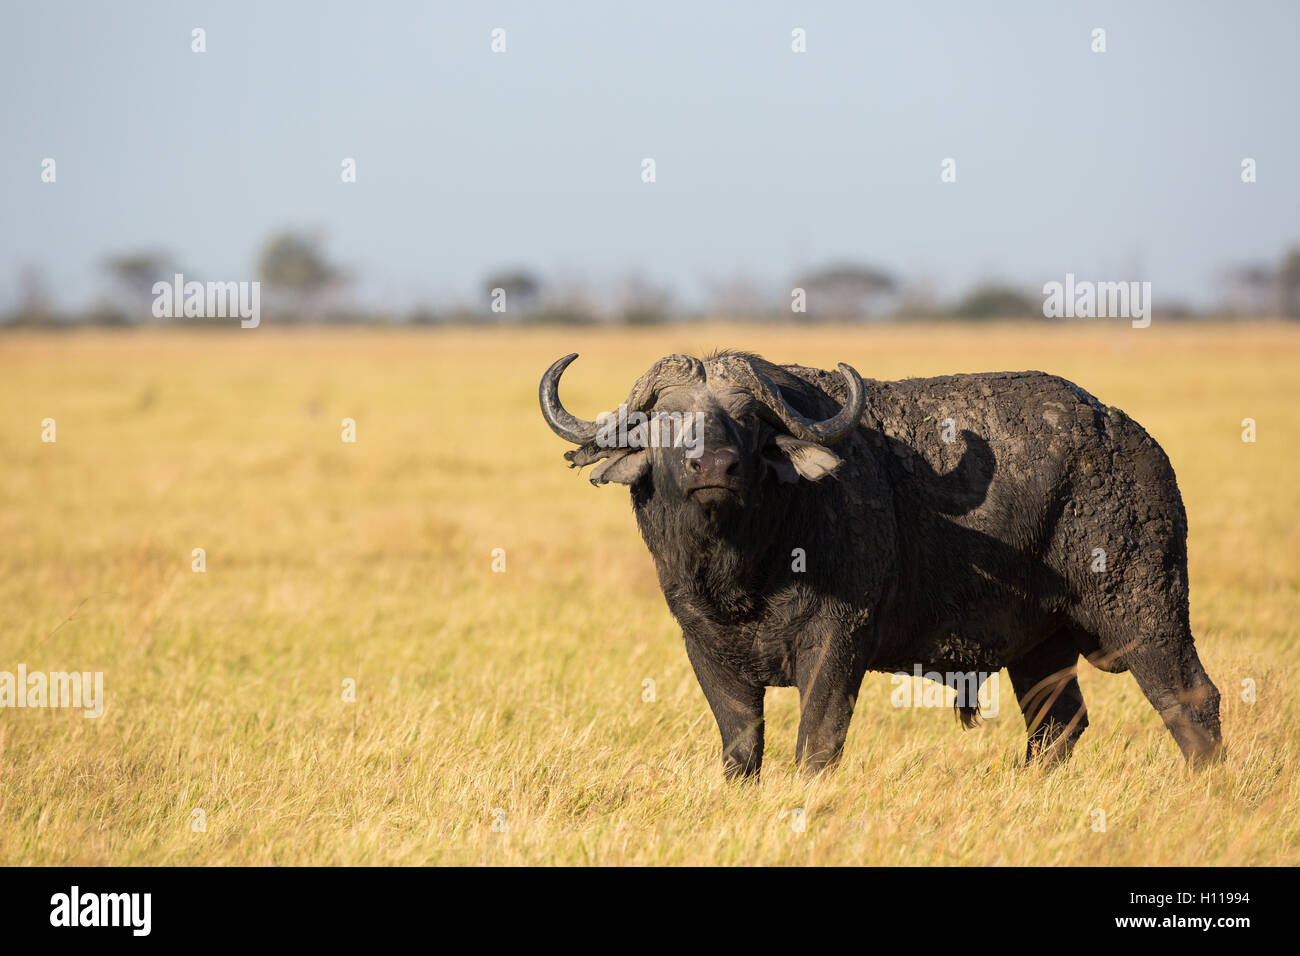 Un fondo fangoso, Lone buffalo (Syncerus caffer) Bull en el Savuti marsh pastizales Imagen De Stock